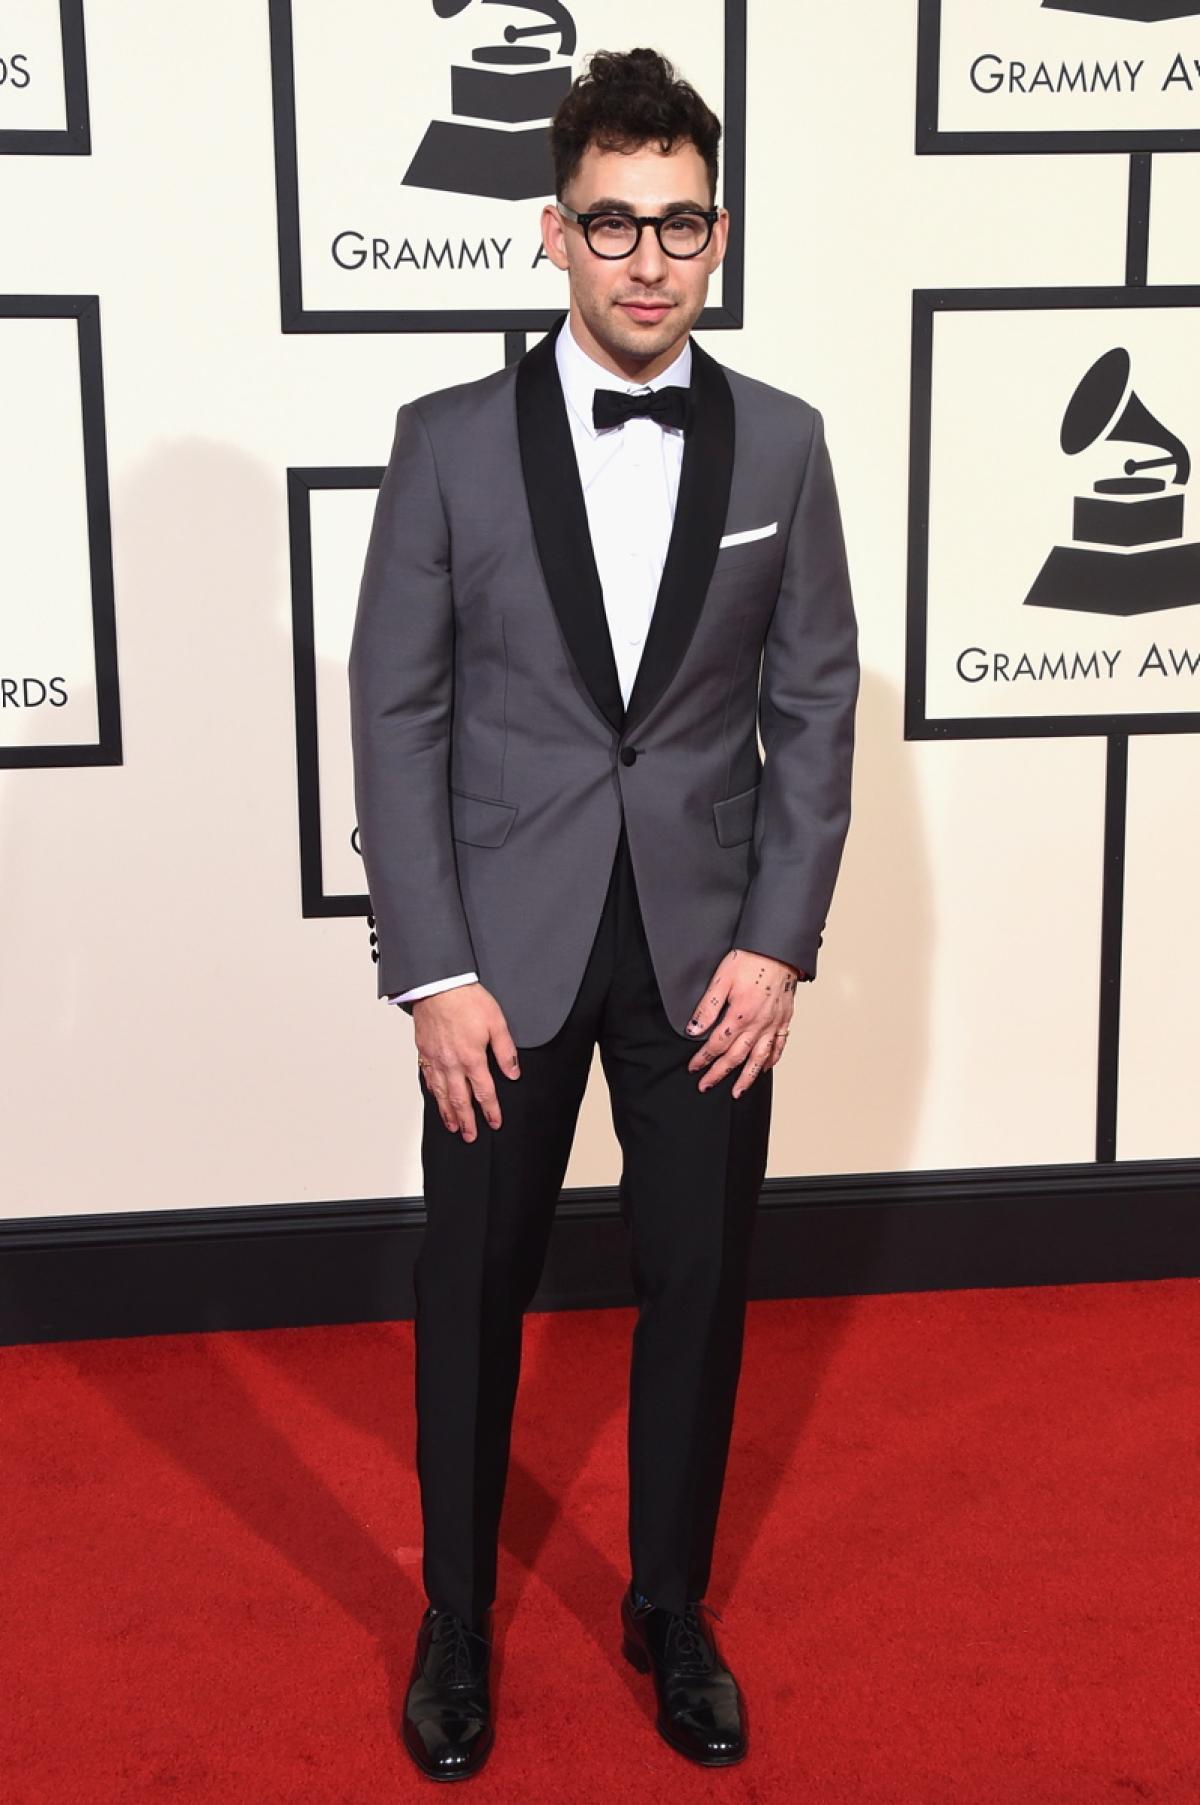 JACK ANTONOFF // Grammy Awards